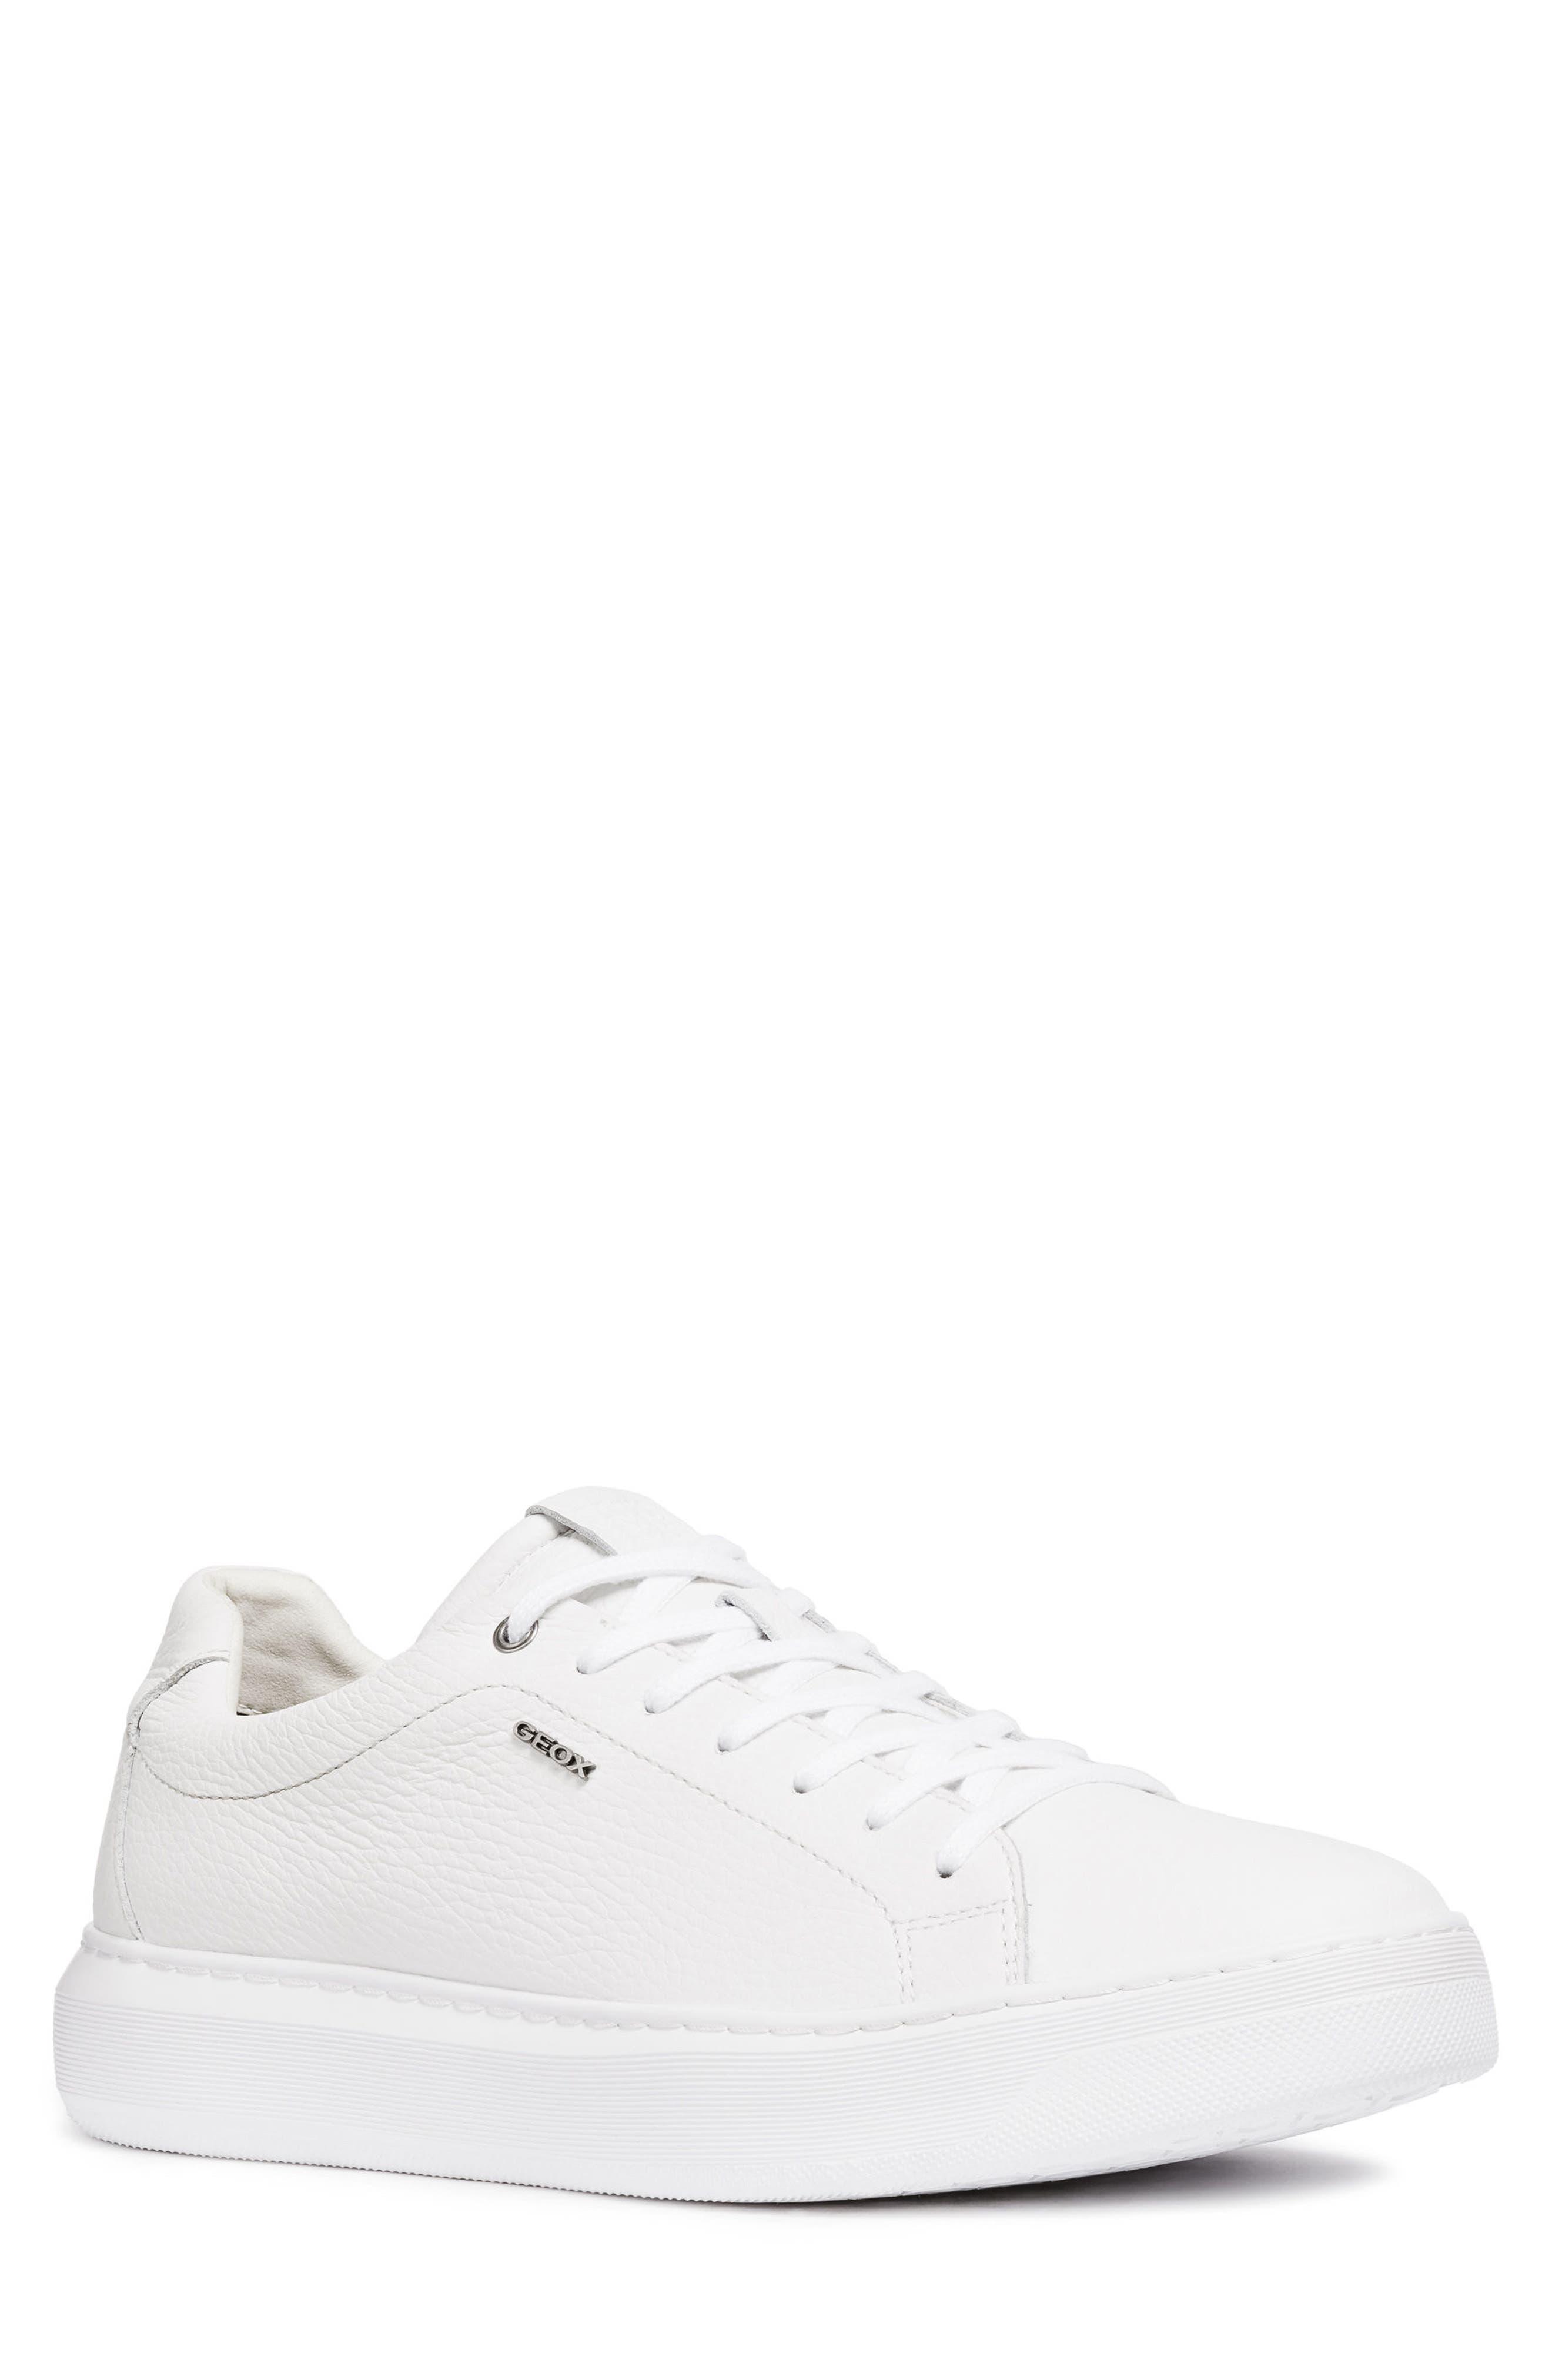 men's geox deiven 6 low top sneaker, size 6us / 39eu - white